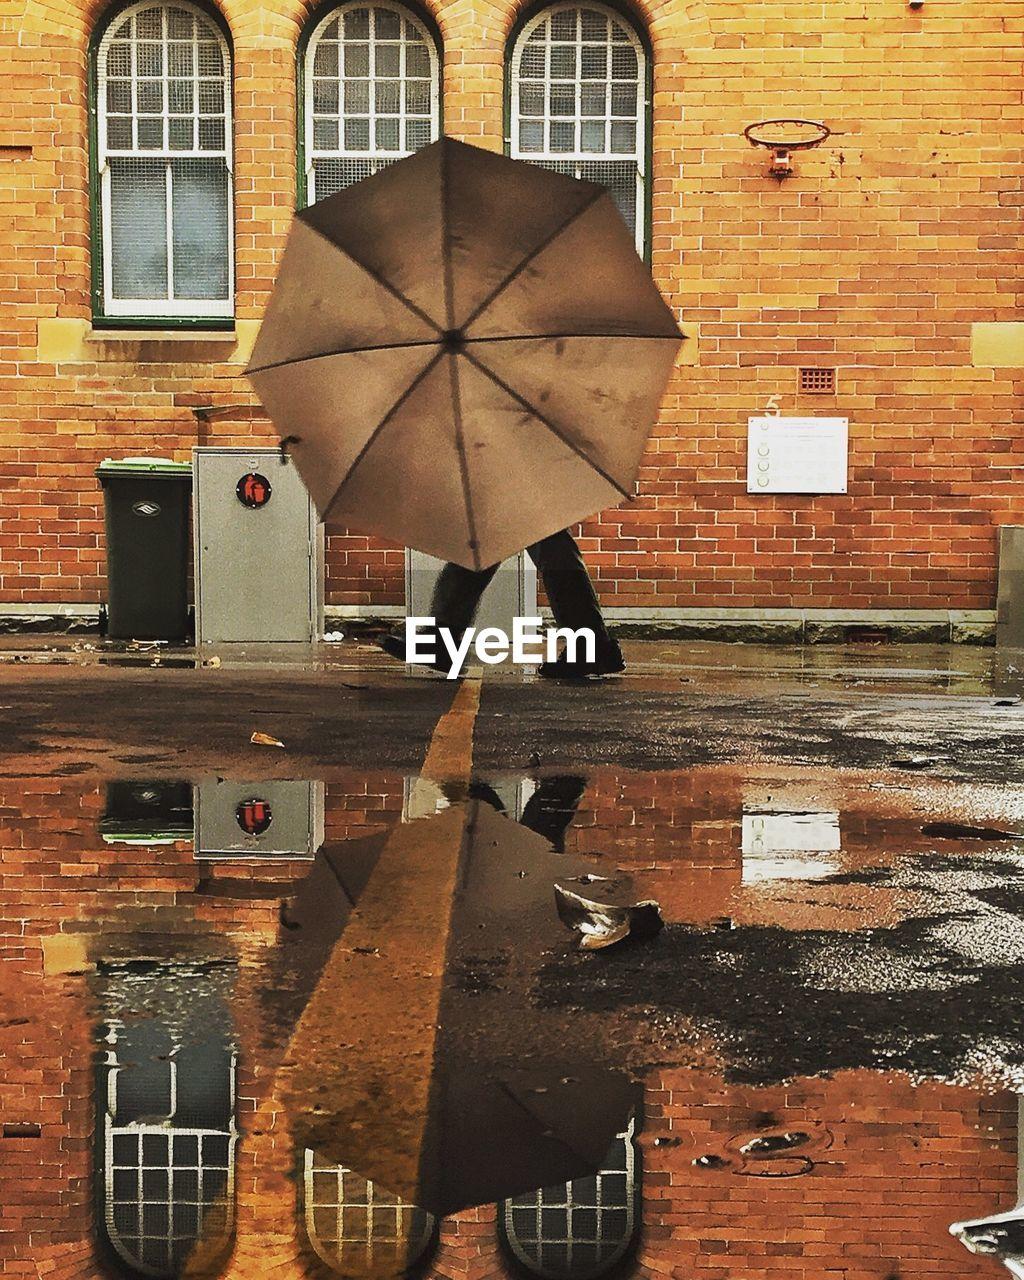 Man With Umbrella Walking On Wet Road During Rainy Season